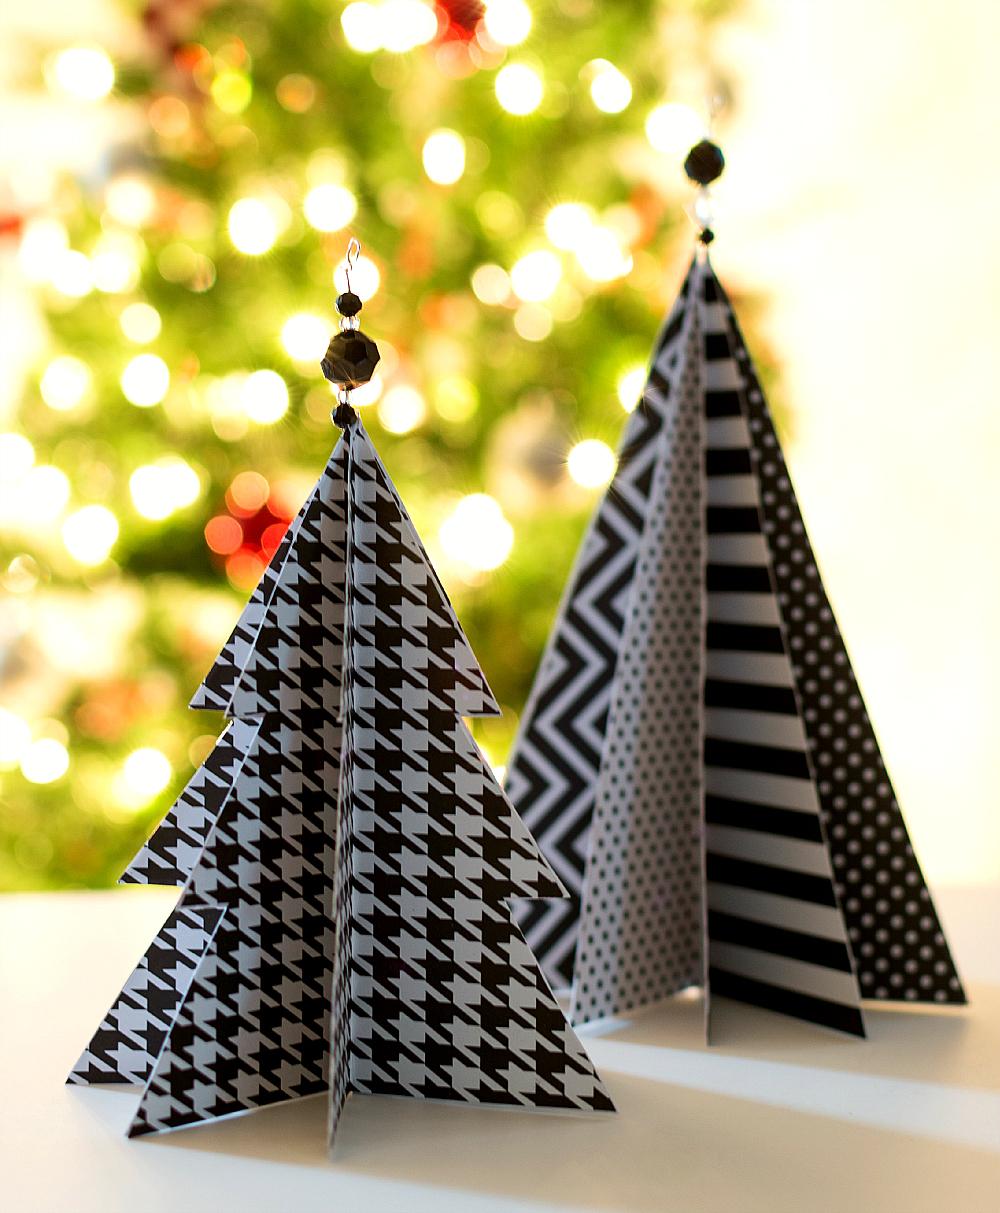 Christmas Craft Ideas: Paper Christmas Trees